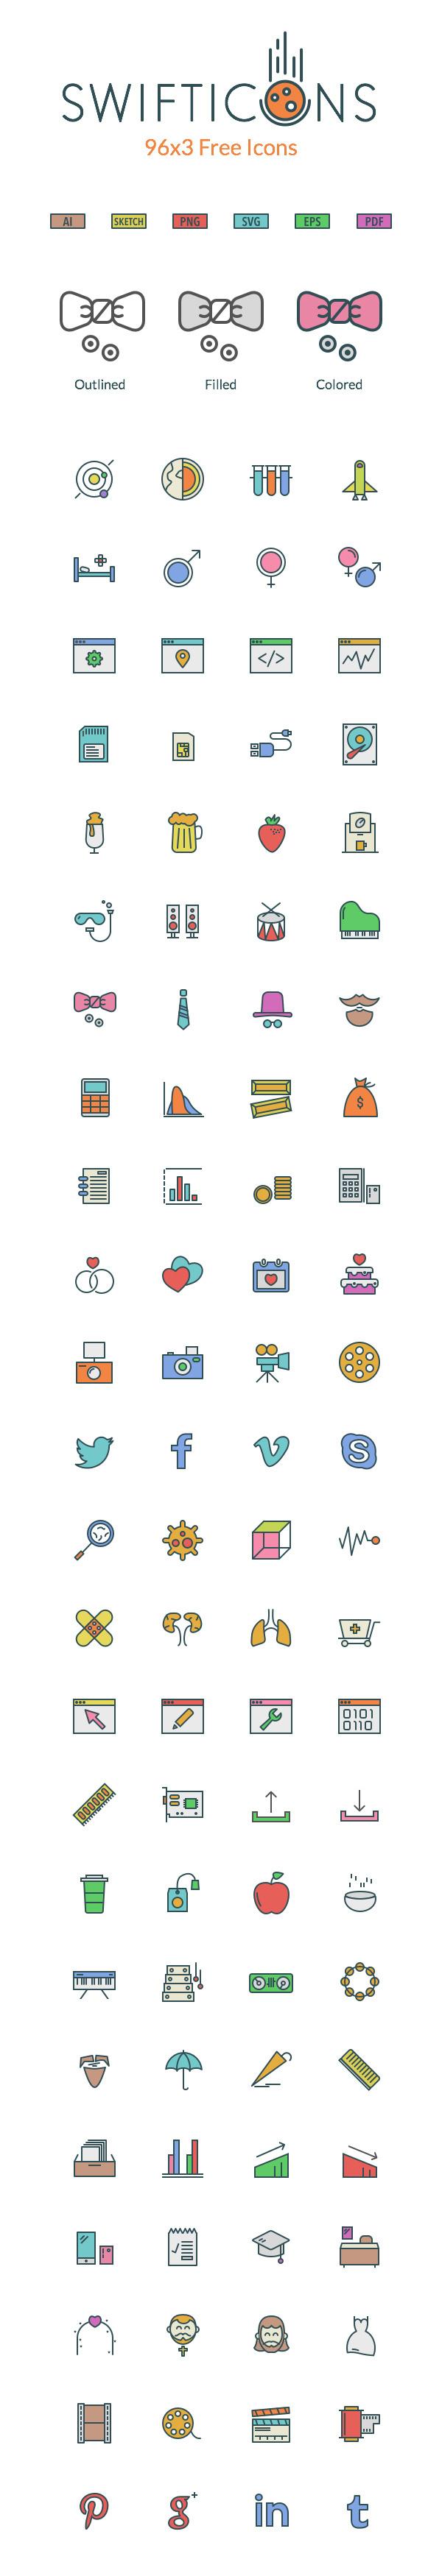 SwiftIcons : 288 Free High Quality Icons